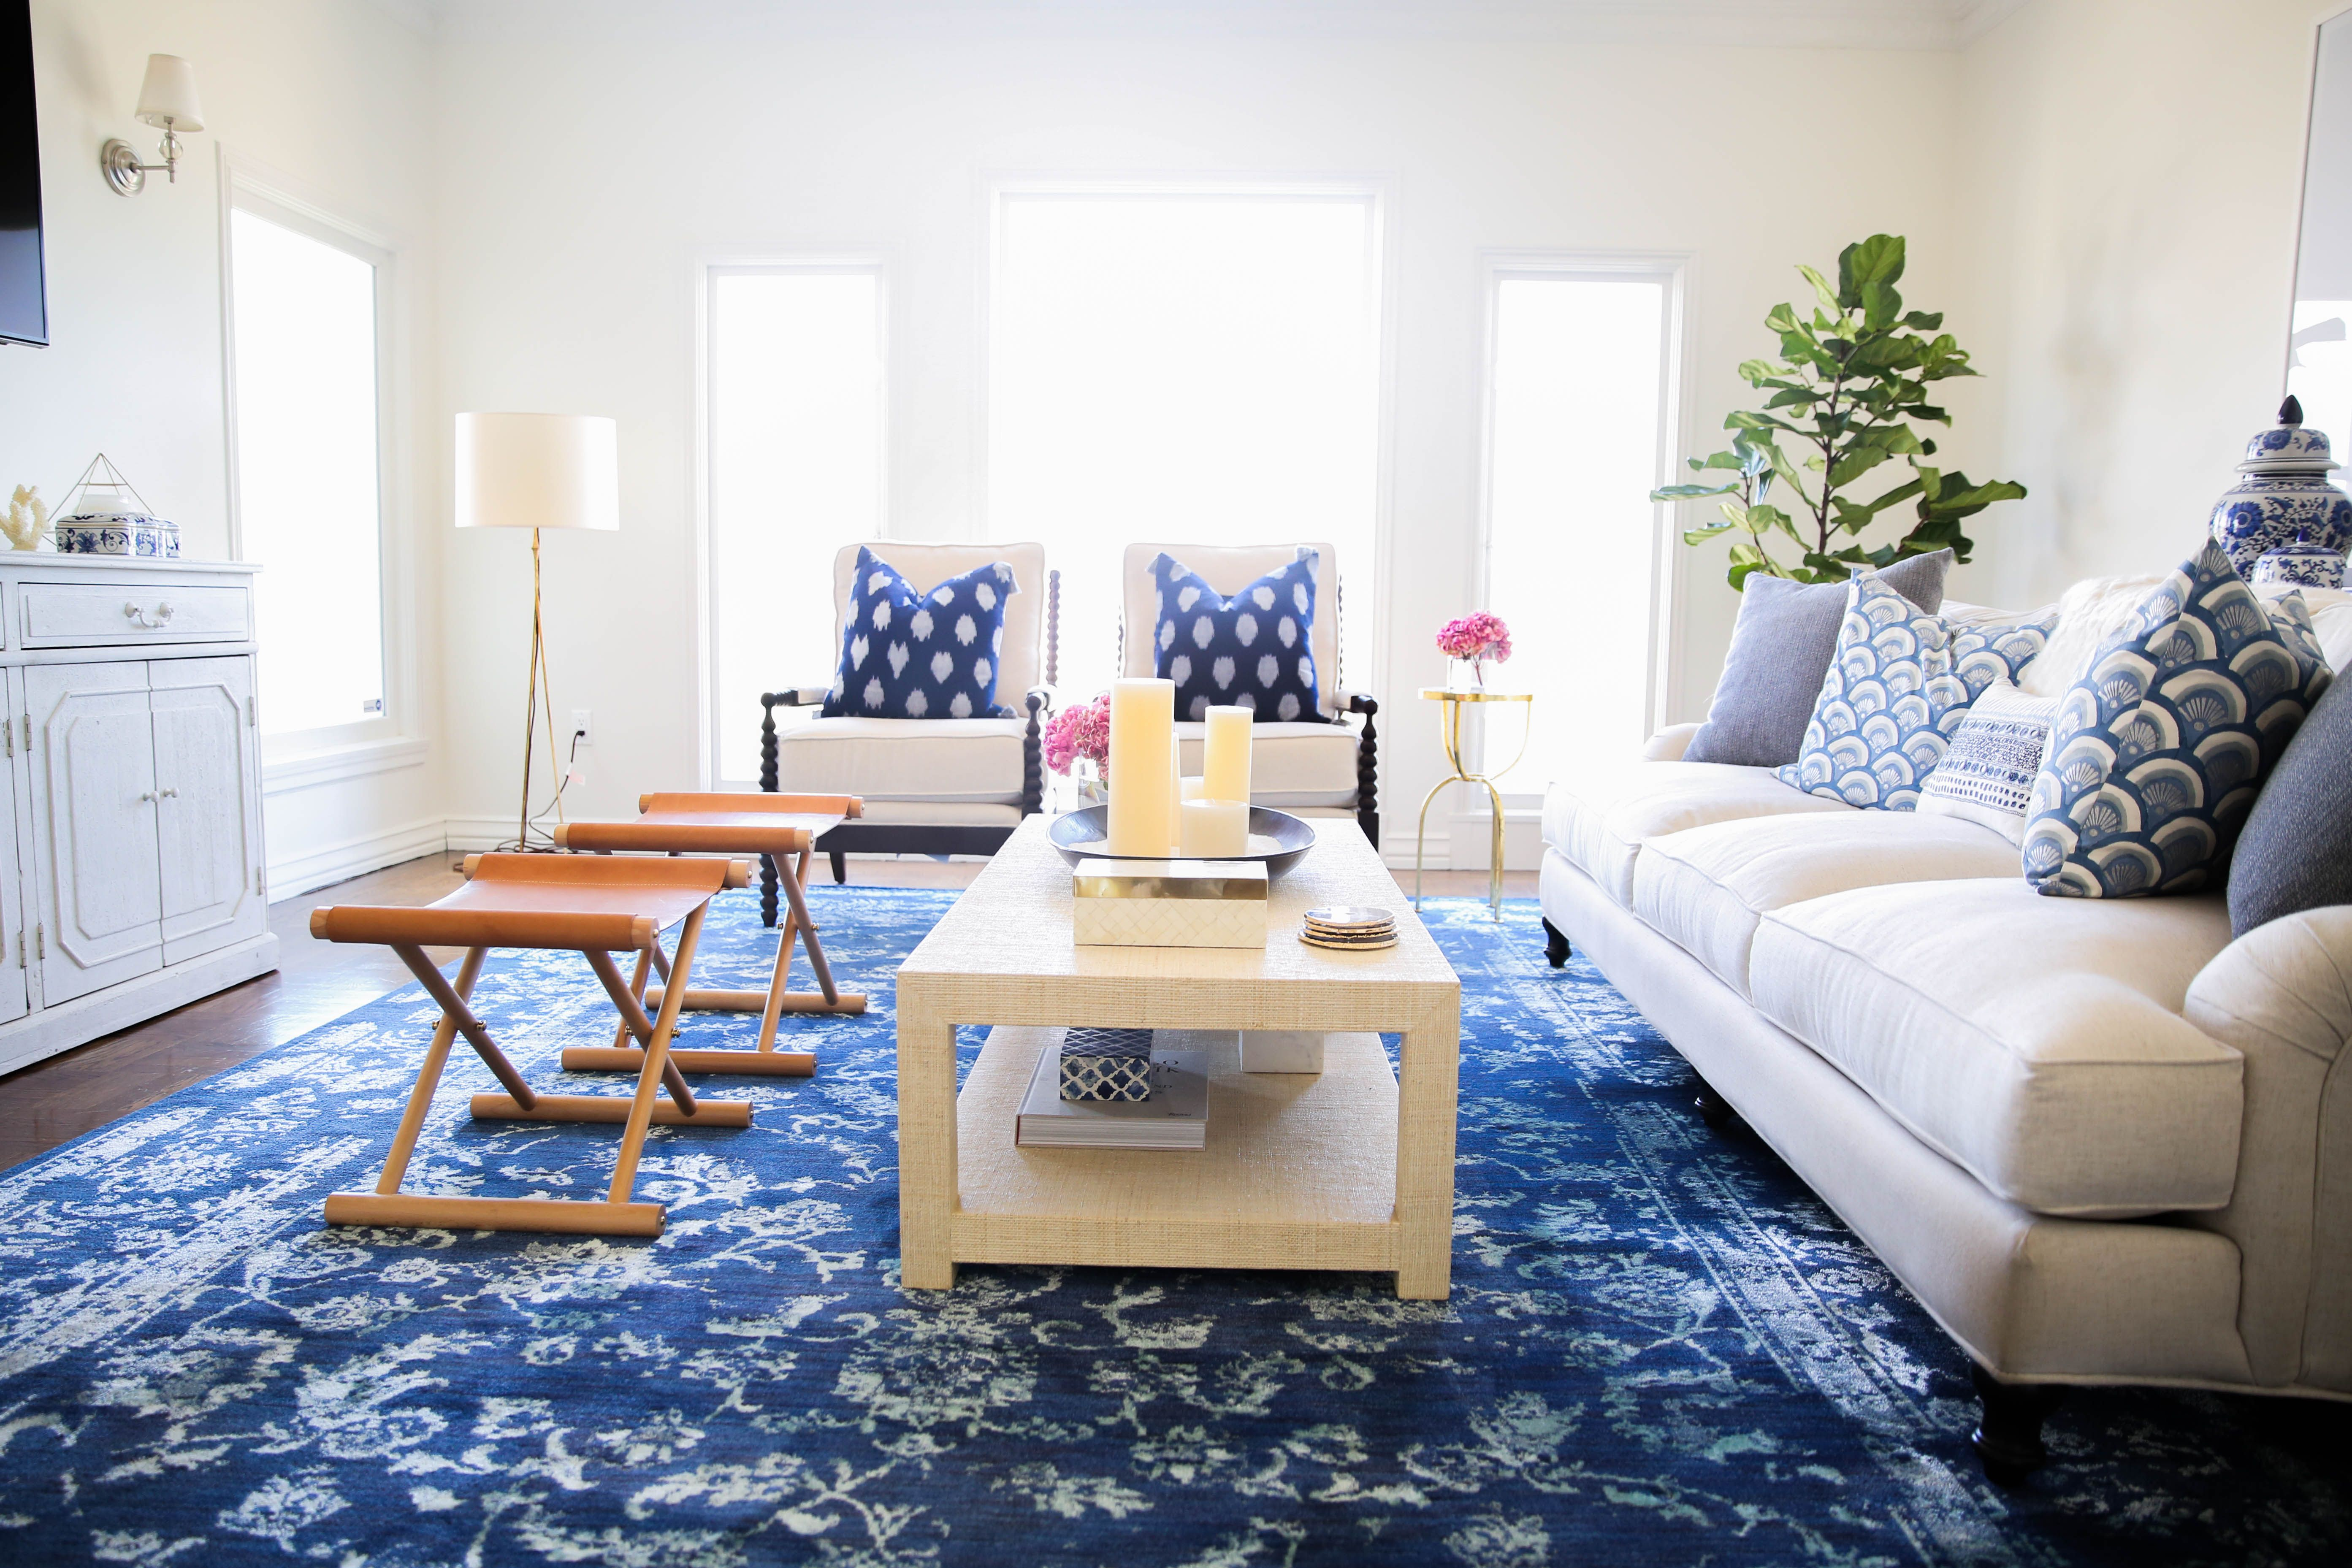 Ariana Lauren living room remodel by Ashley Katherine of Modern Glam ...